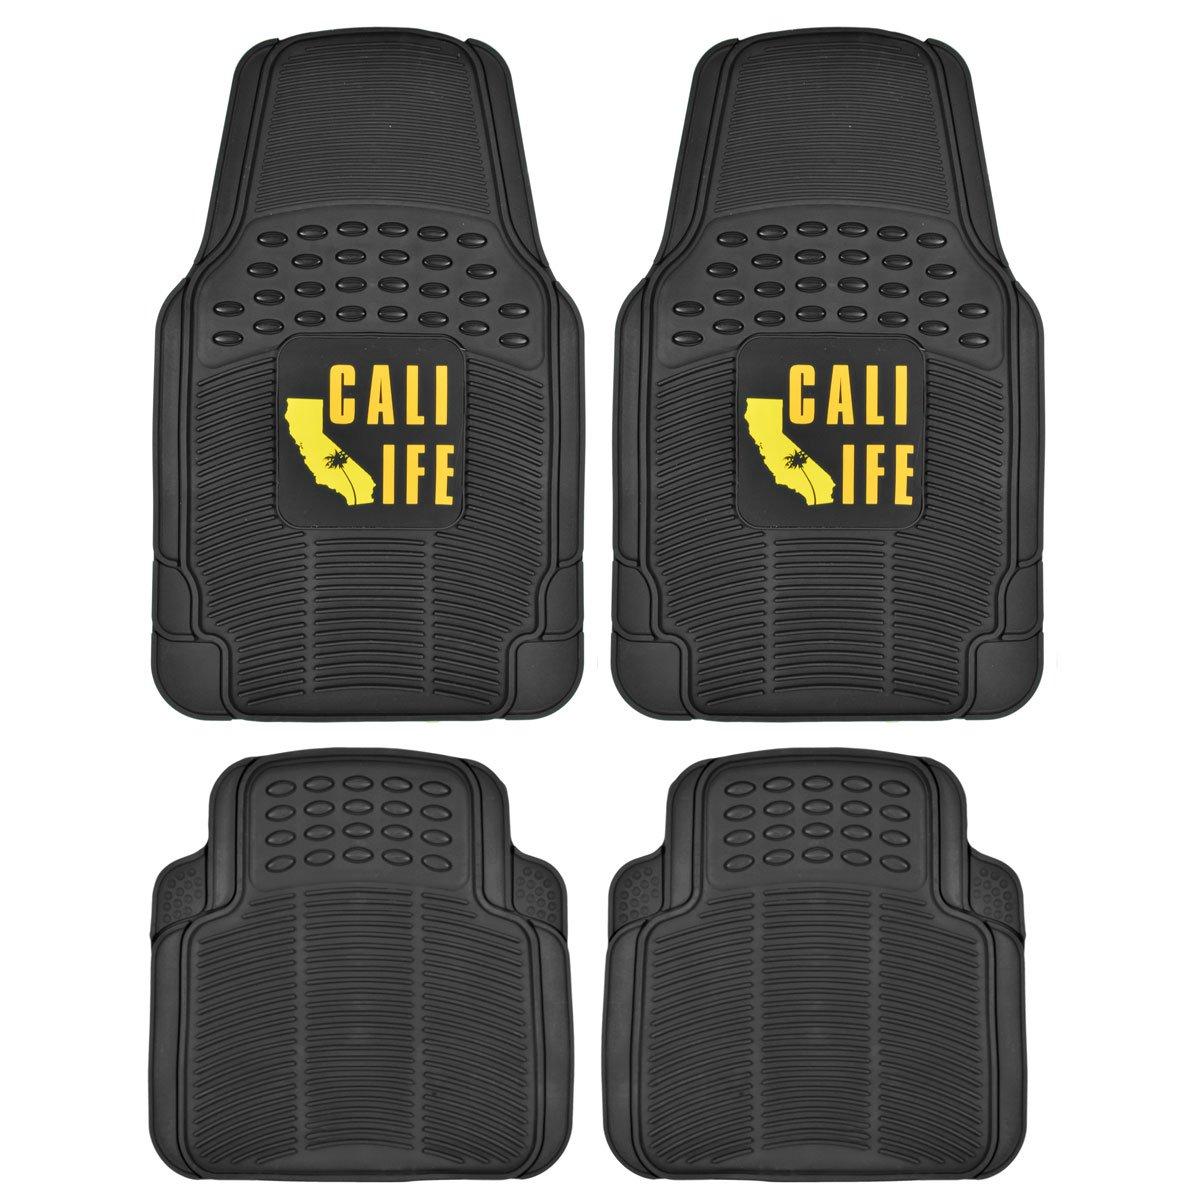 California Life Rubber - 4 Pieces, Heavy Duty All Weather Protection BDK MT-812+MT-802-BK Black Floor Mat